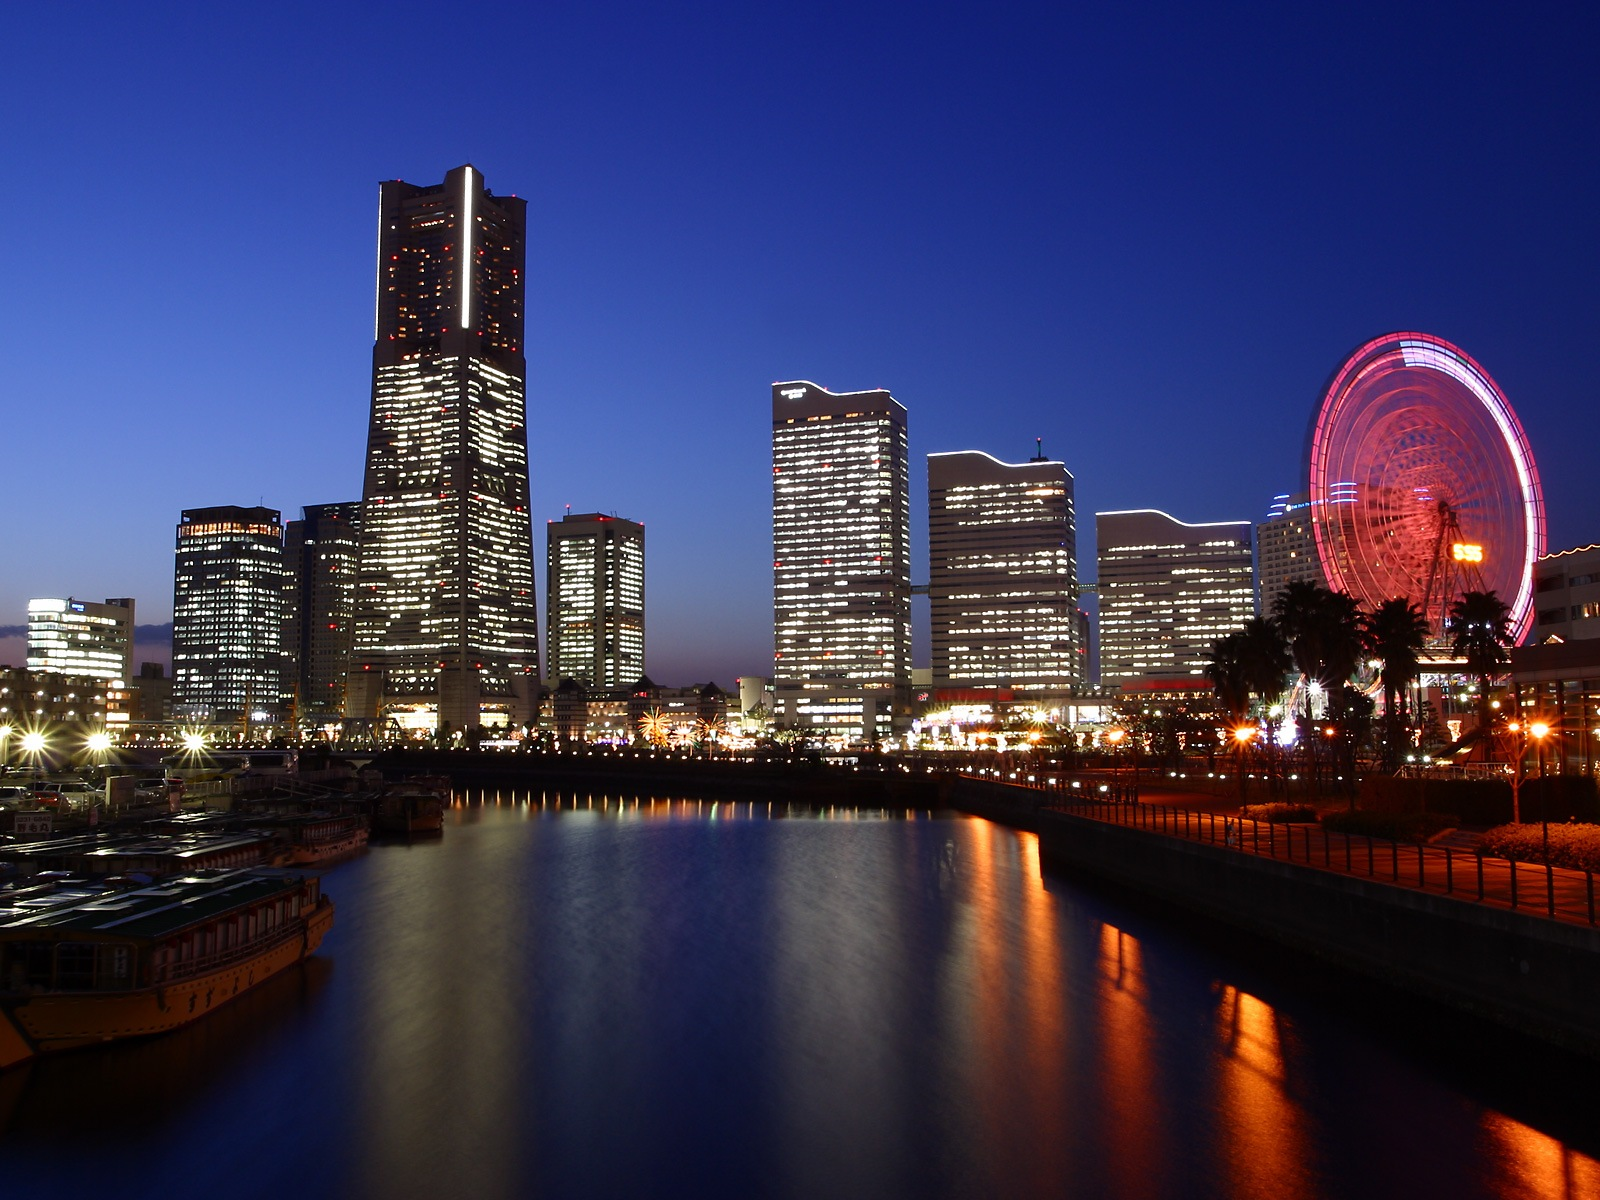 http://2.bp.blogspot.com/-oHESfXl5iKU/TrFC-rEyd2I/AAAAAAAACh4/nmGmSPvl2IM/s1600/Amazing+View+of+City+Metropolis+at+Night-9.jpg